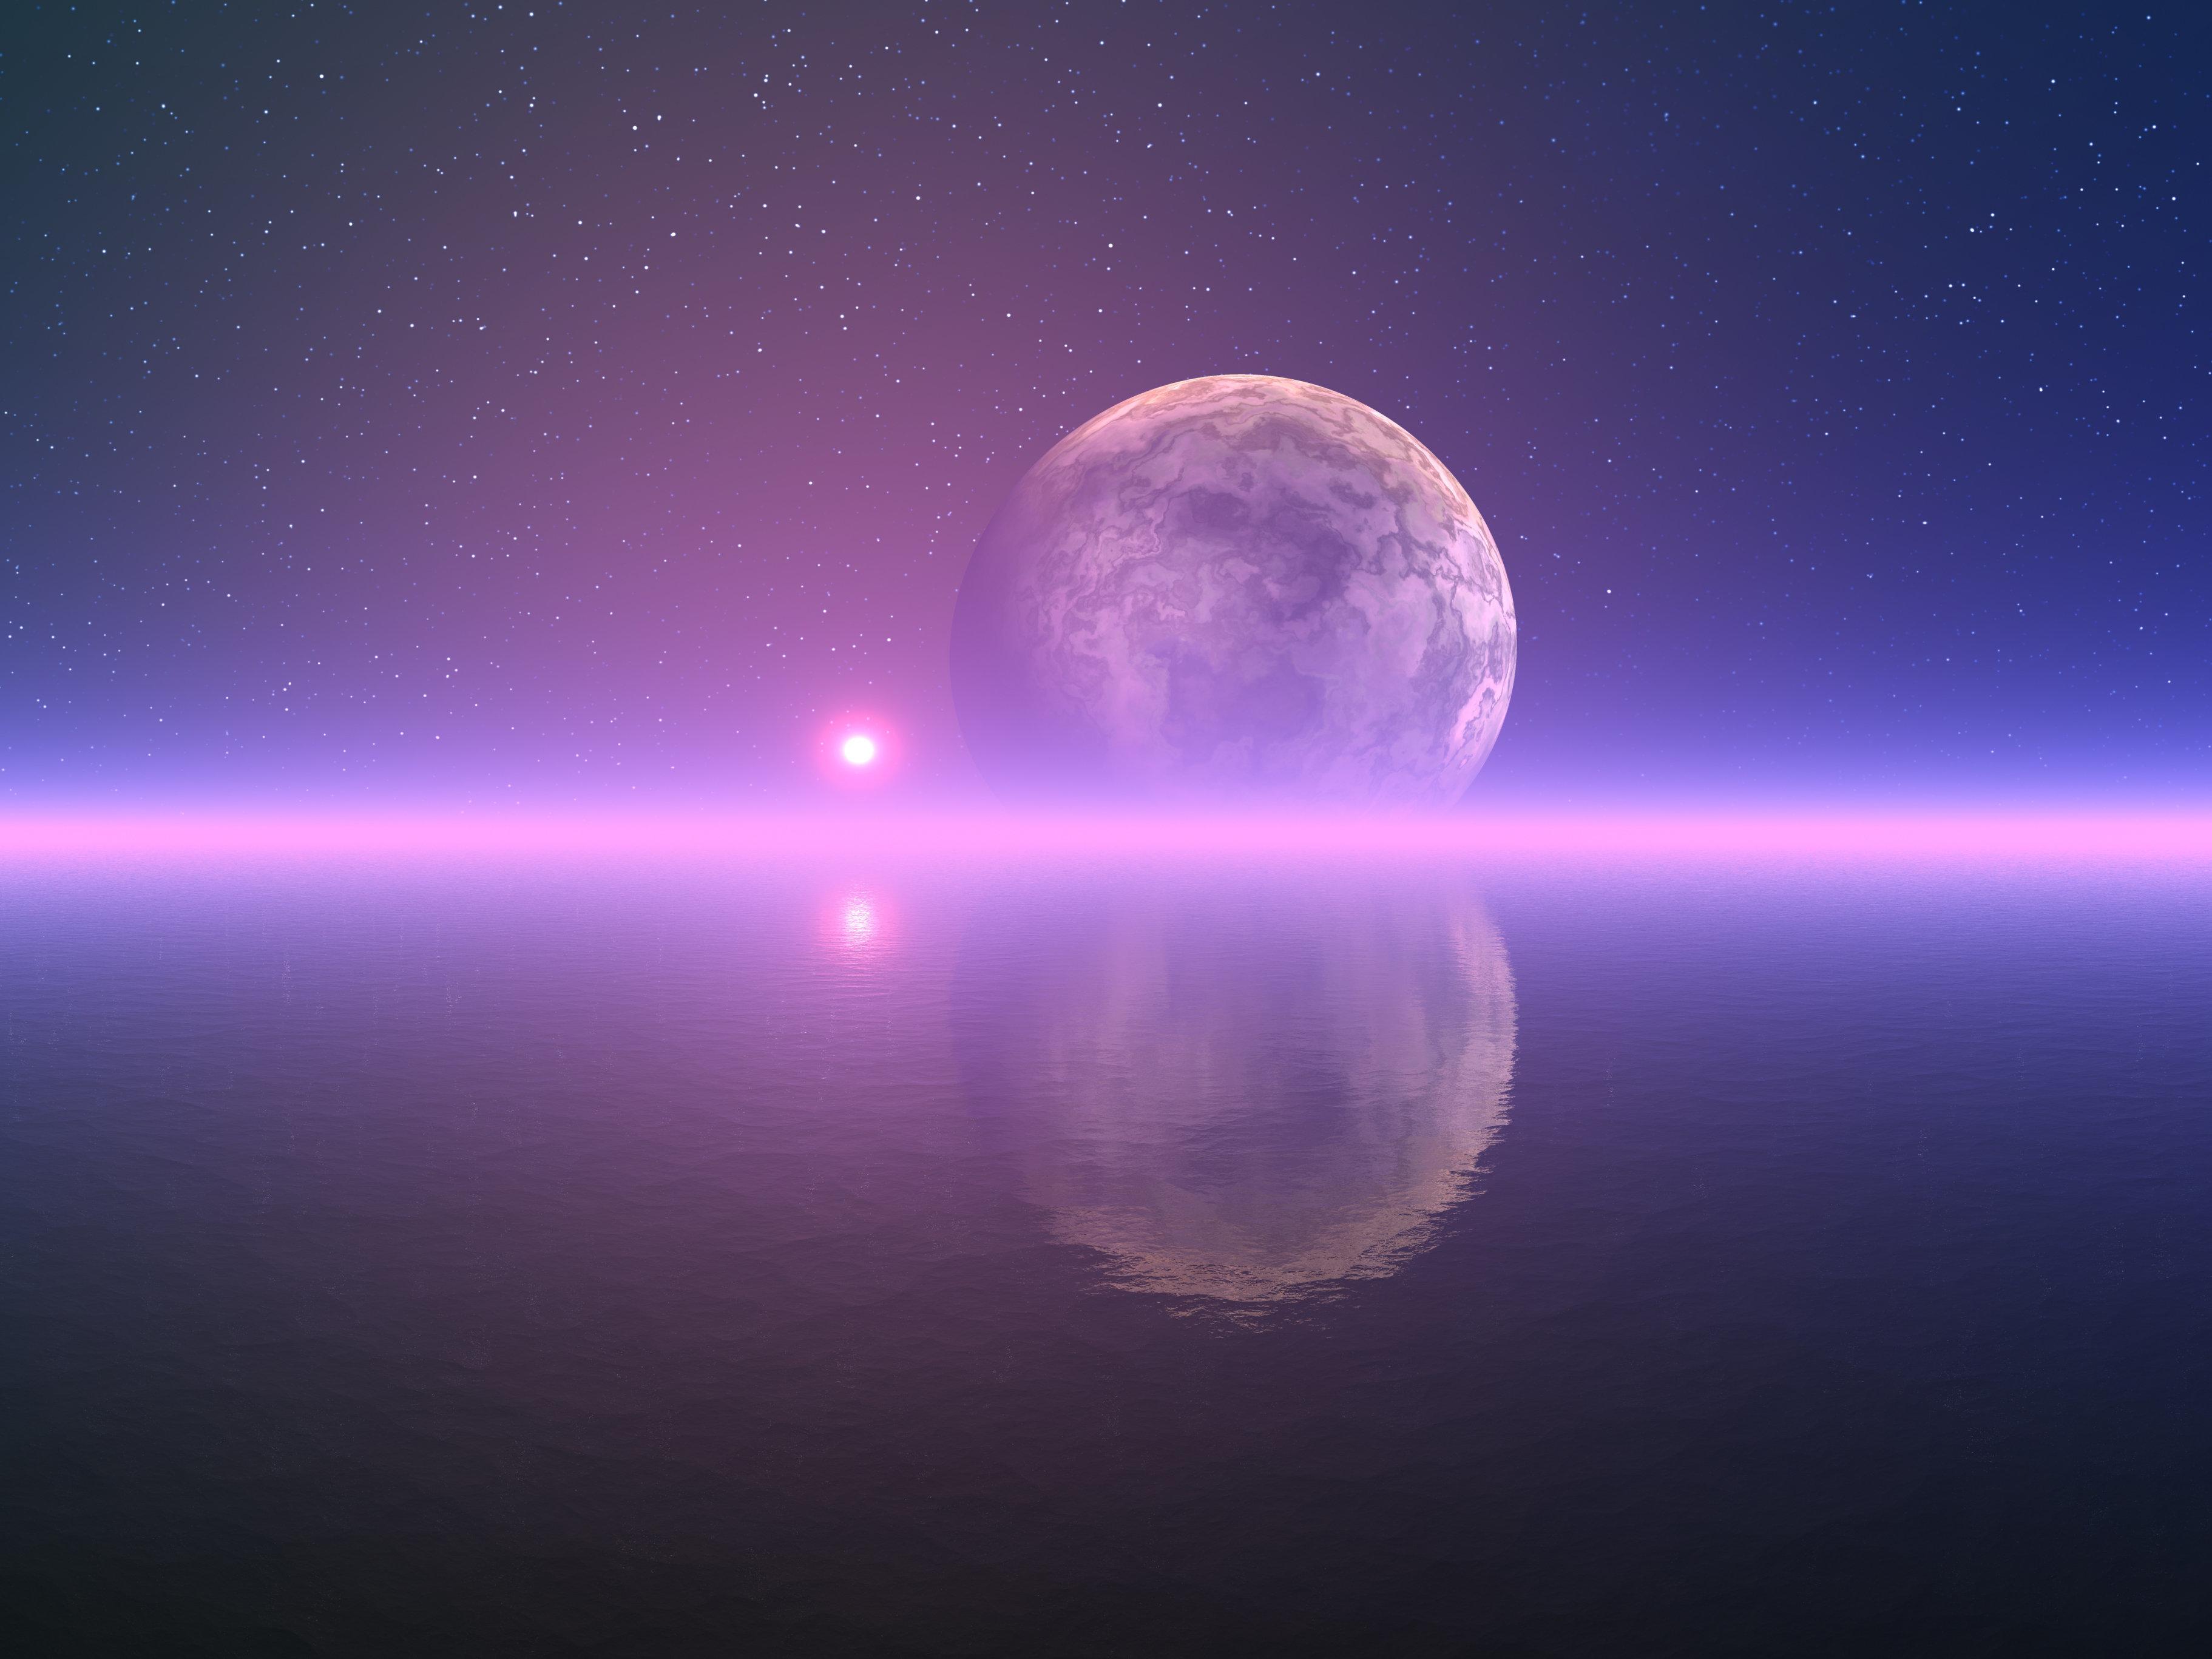 Alien lunar seascape